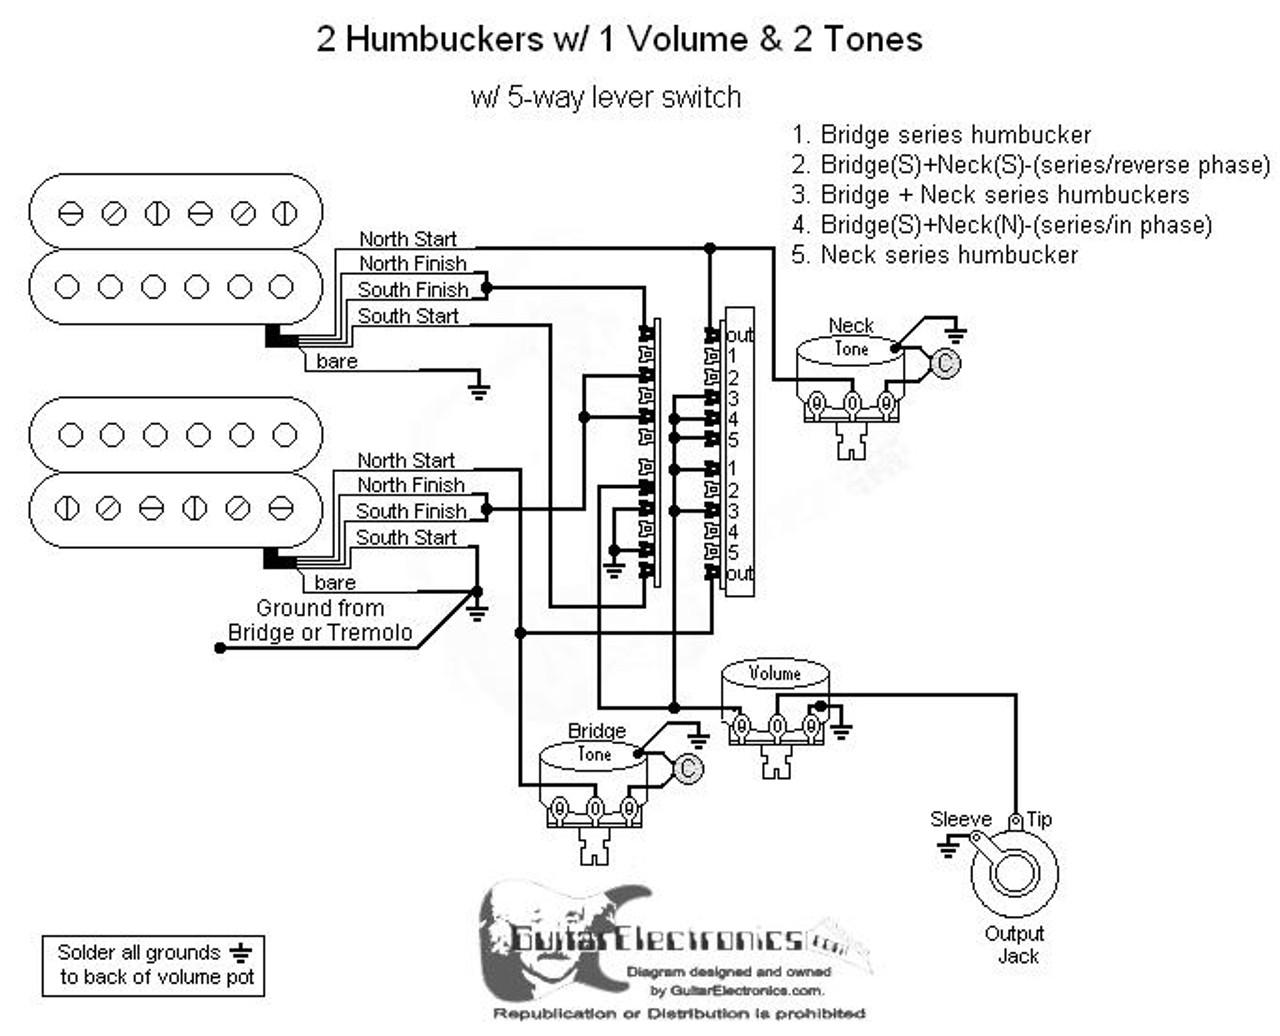 guitar wiring diagram 2 humbuckers 1 volume wiring diagrams terms2 humbuckers 5 way lever switch 1 [ 1280 x 1036 Pixel ]